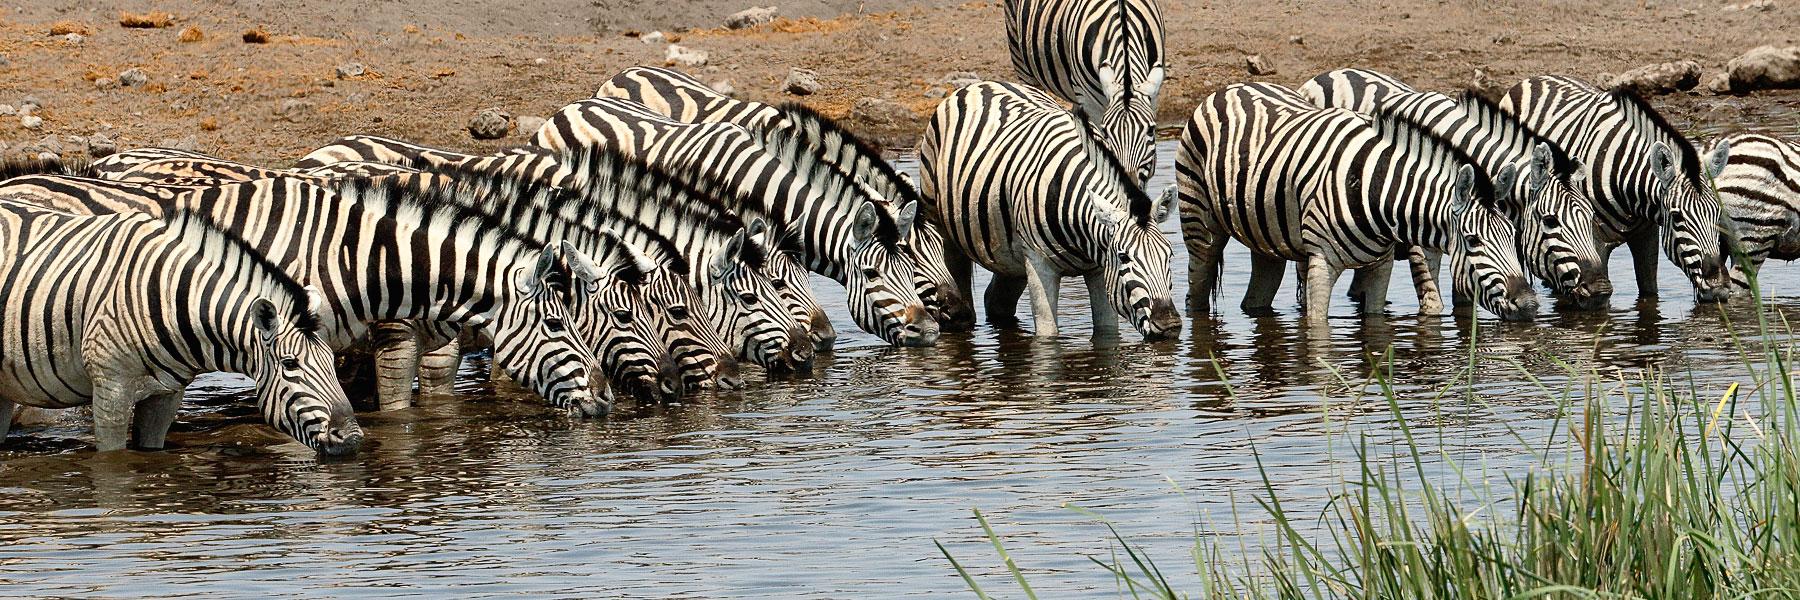 Zèbres-Etosha-Namibie